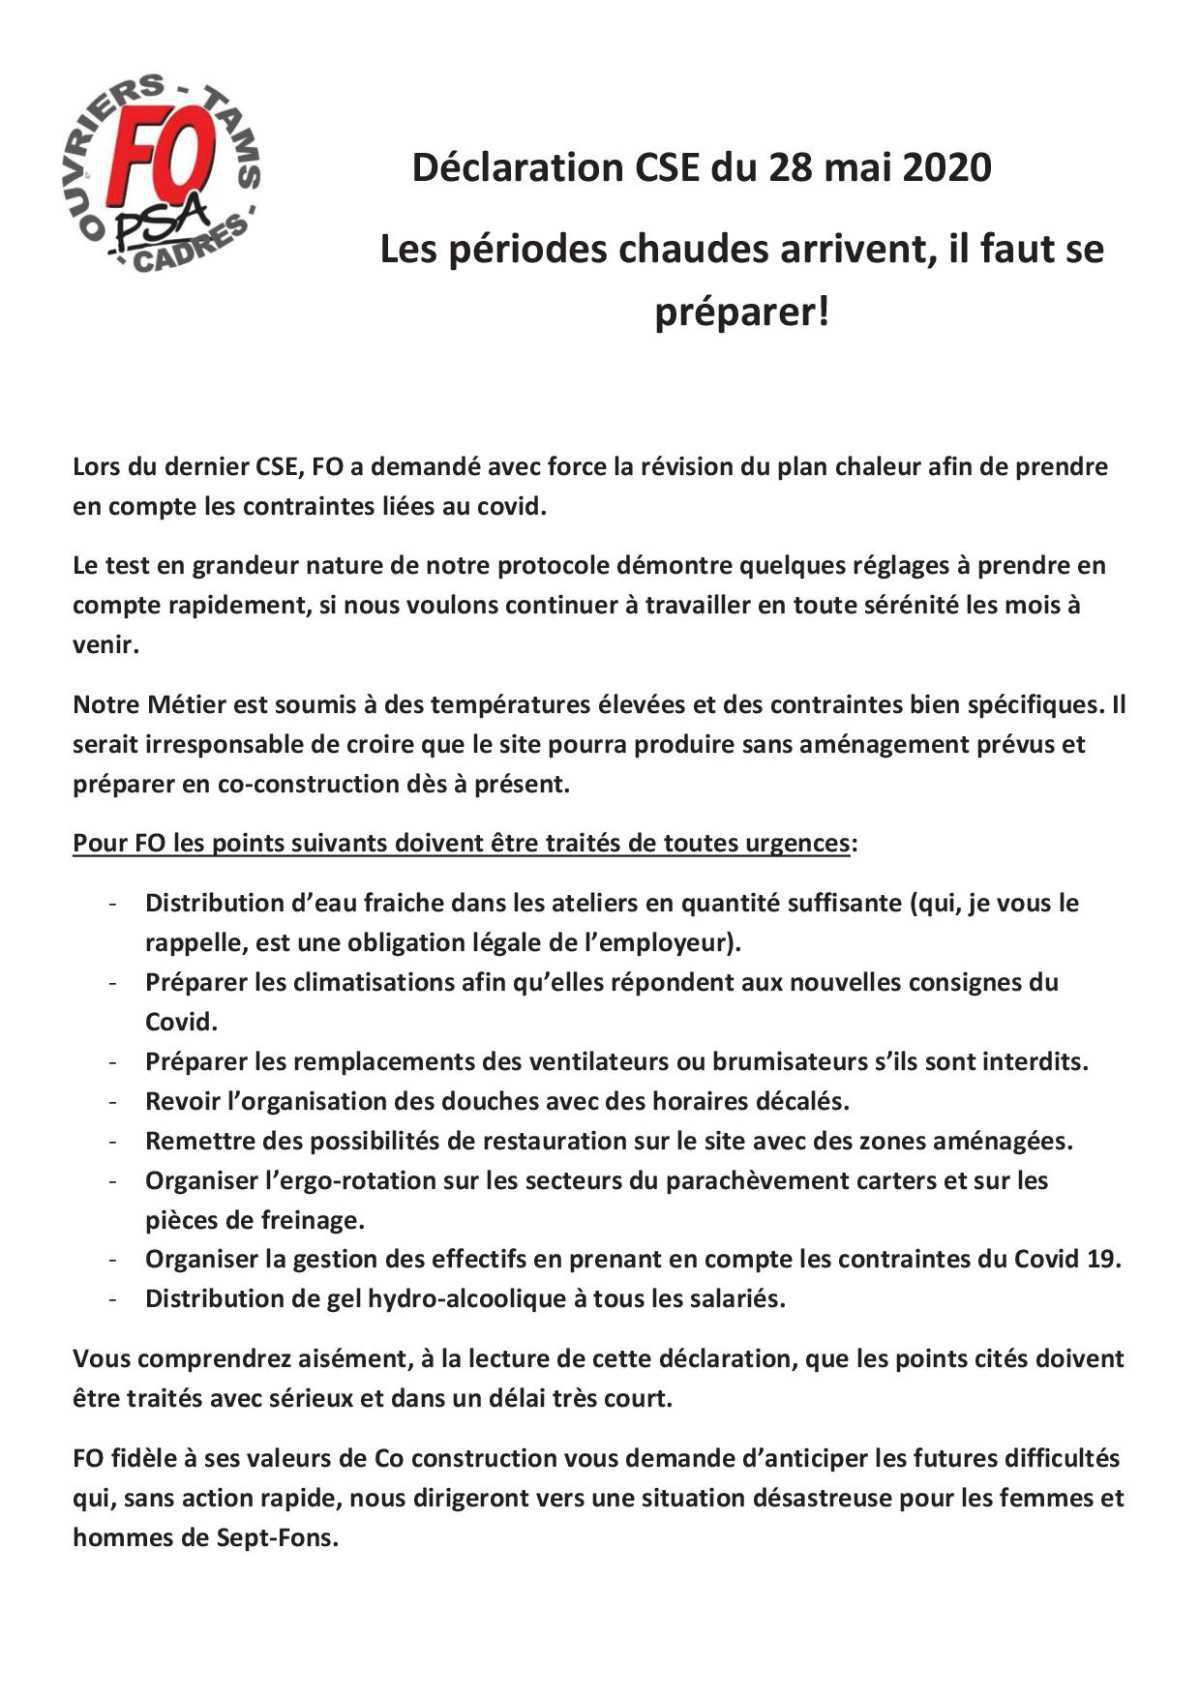 Déclaration FO CSE 28 Mai 2020